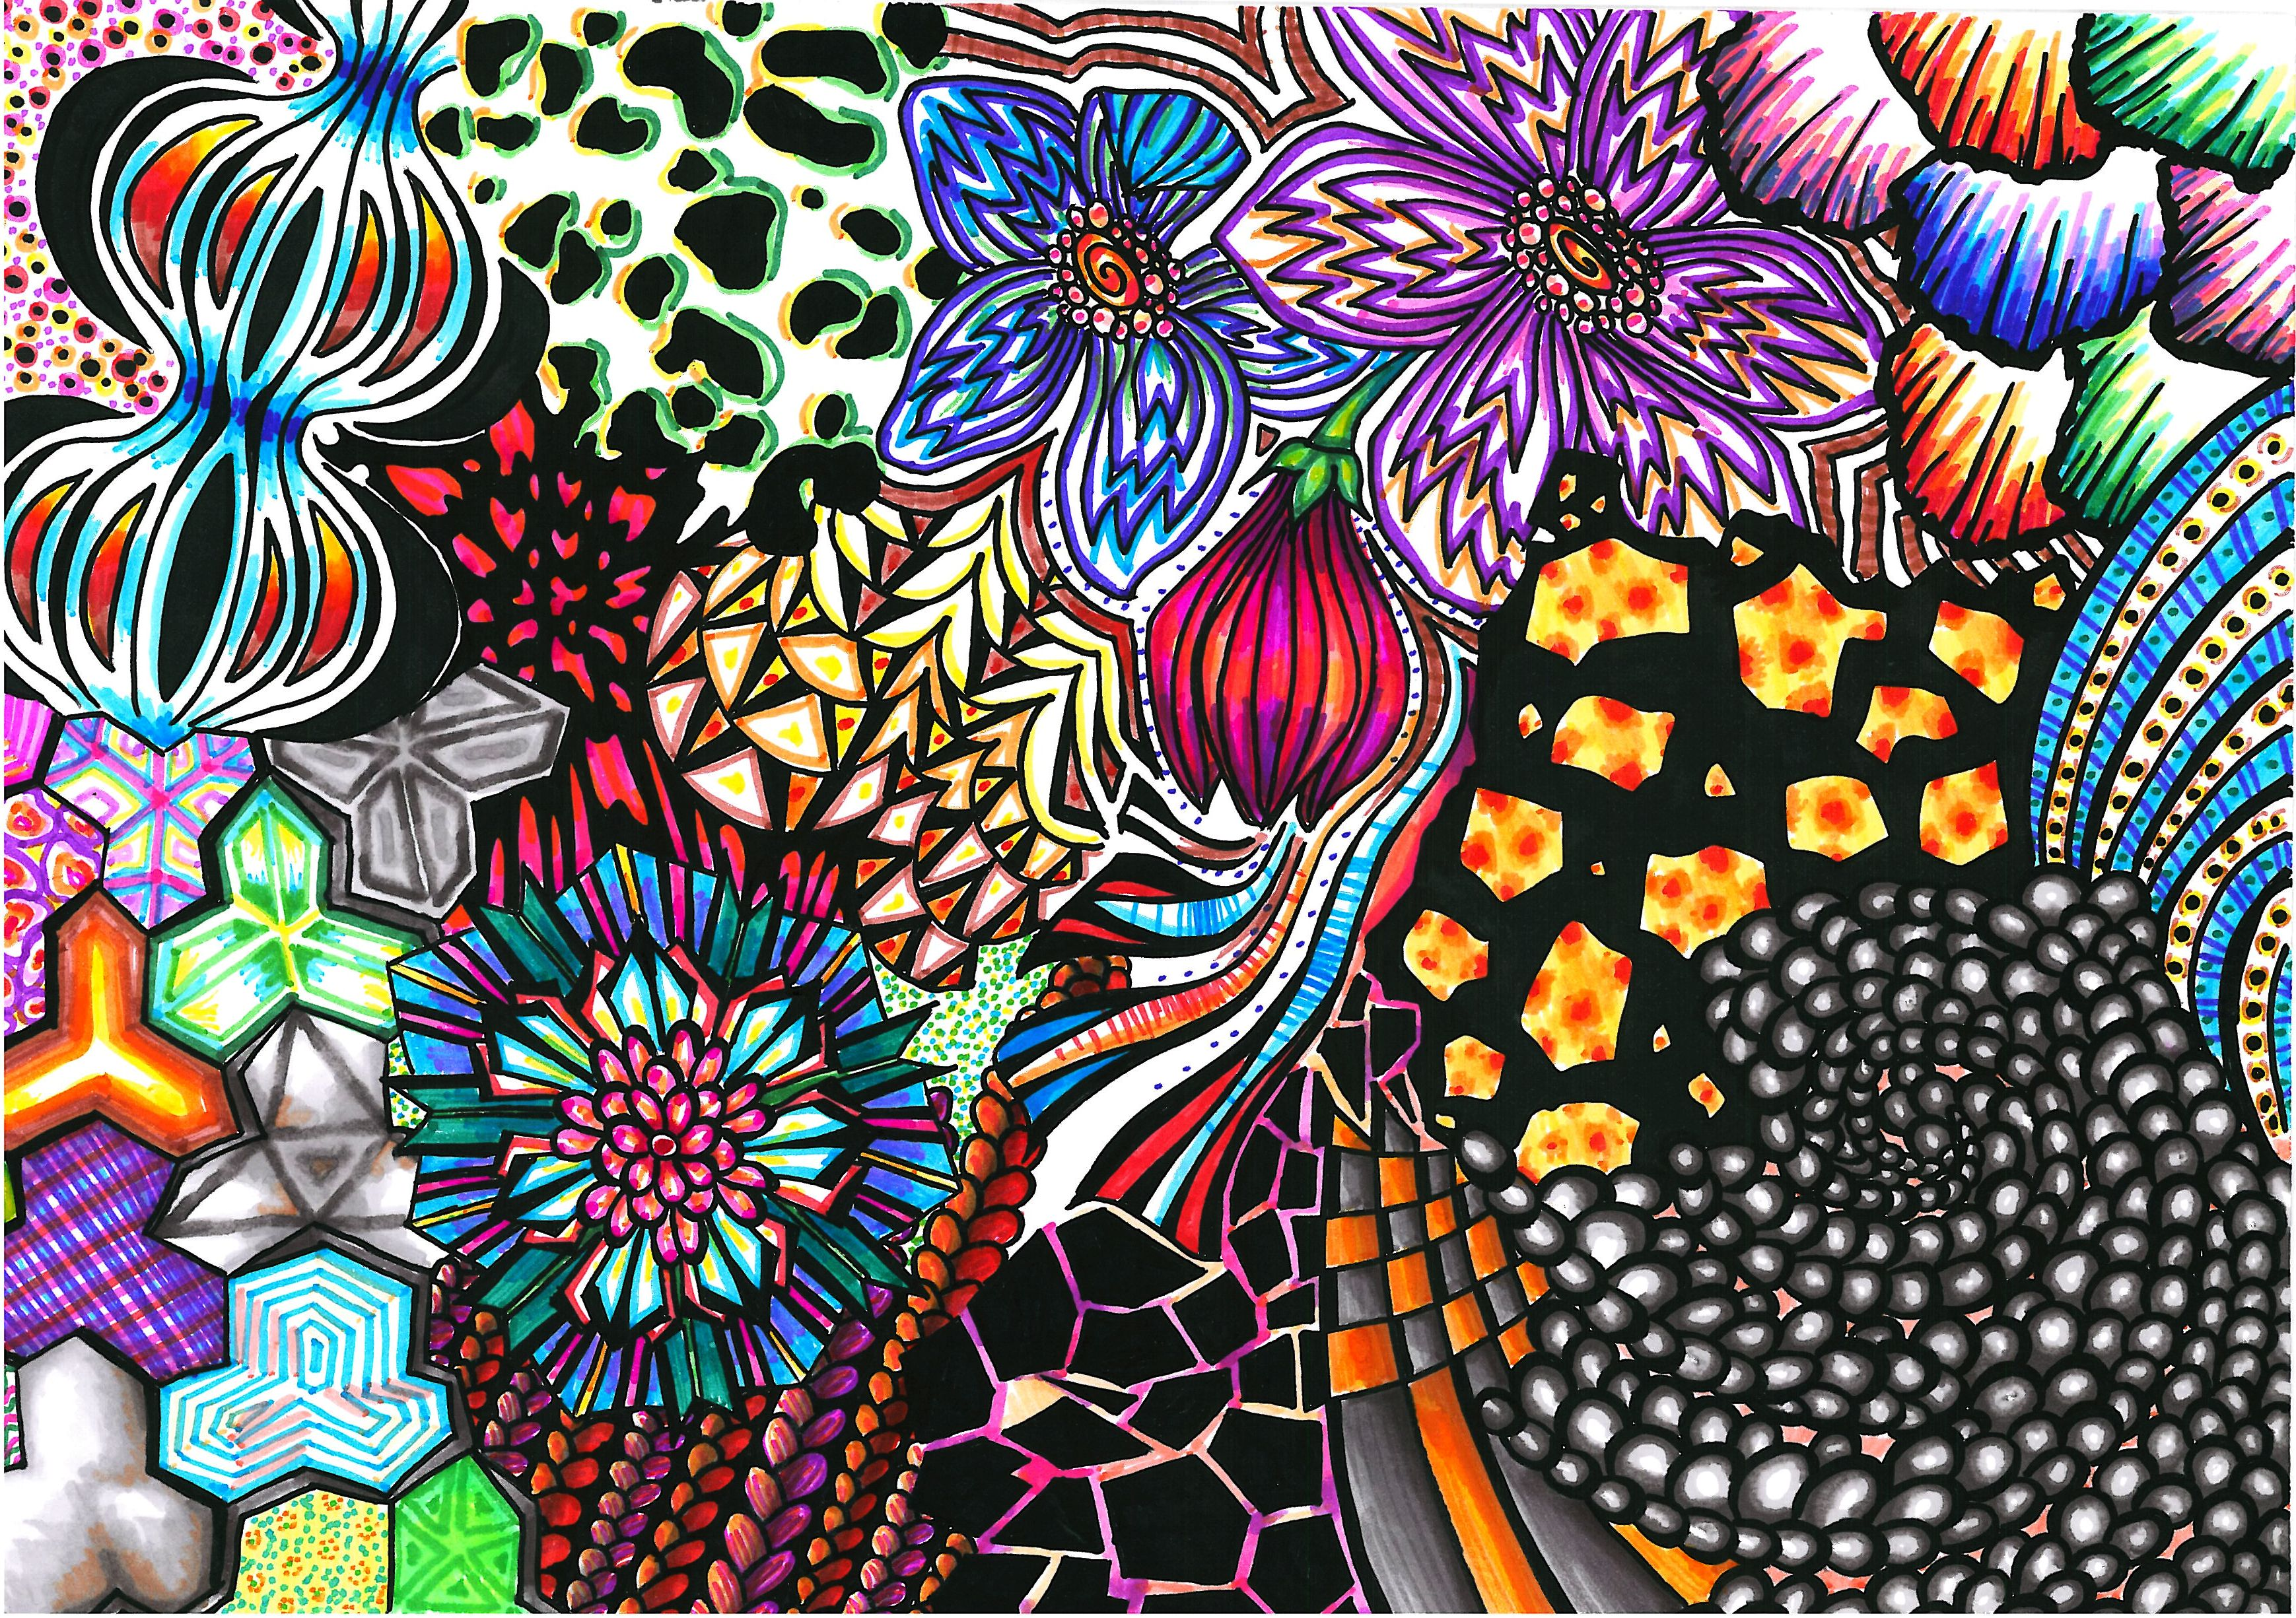 [RYSUNKI]- czyli mini Deviant Saf - Page 6 Kolorowa_abstrakcja_2_by_fandragonball-d9rmrc7